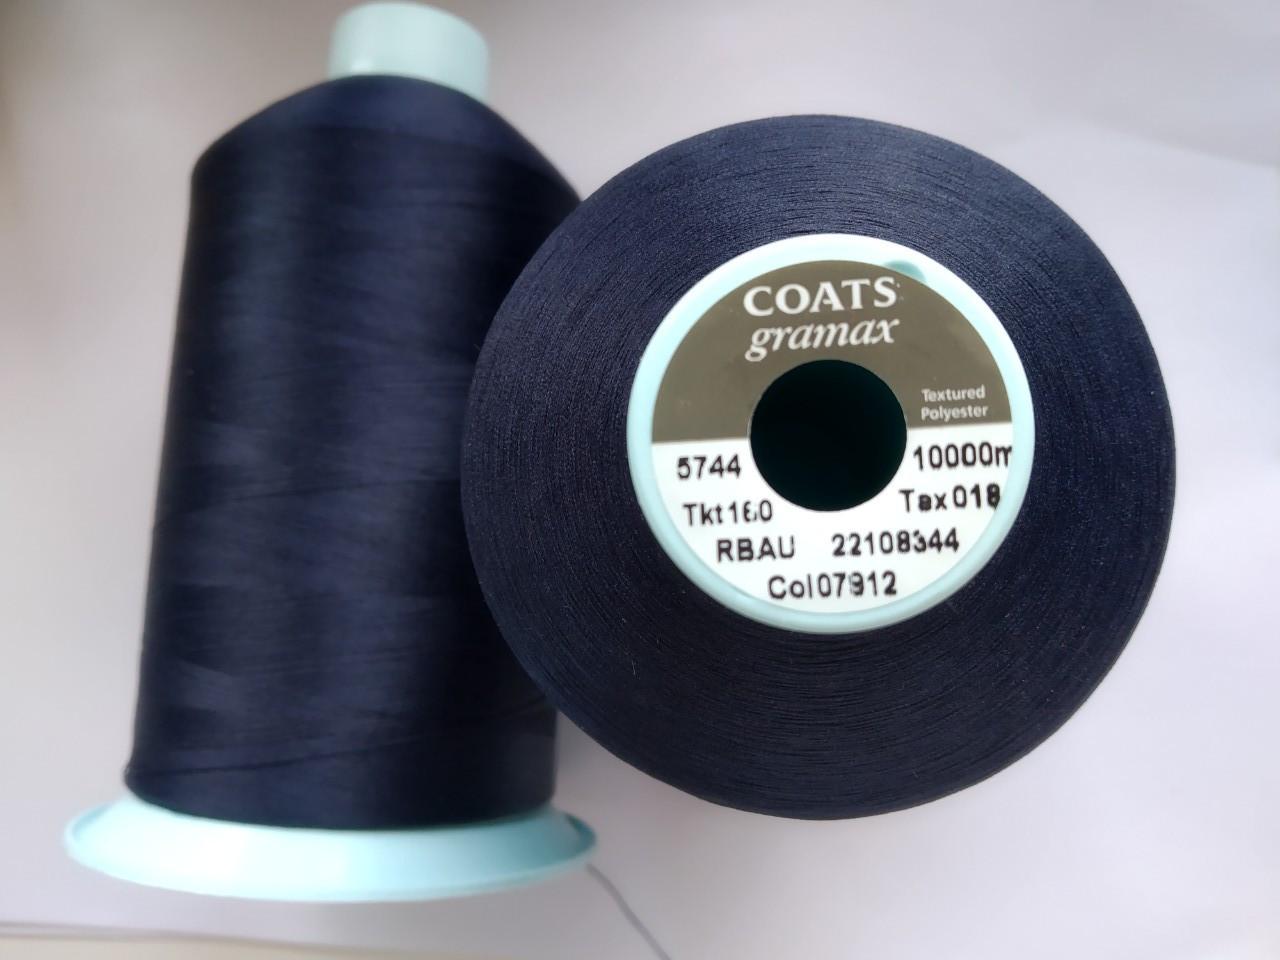 Текстурована нитка Coats gramax 160/ 10000v / 07912